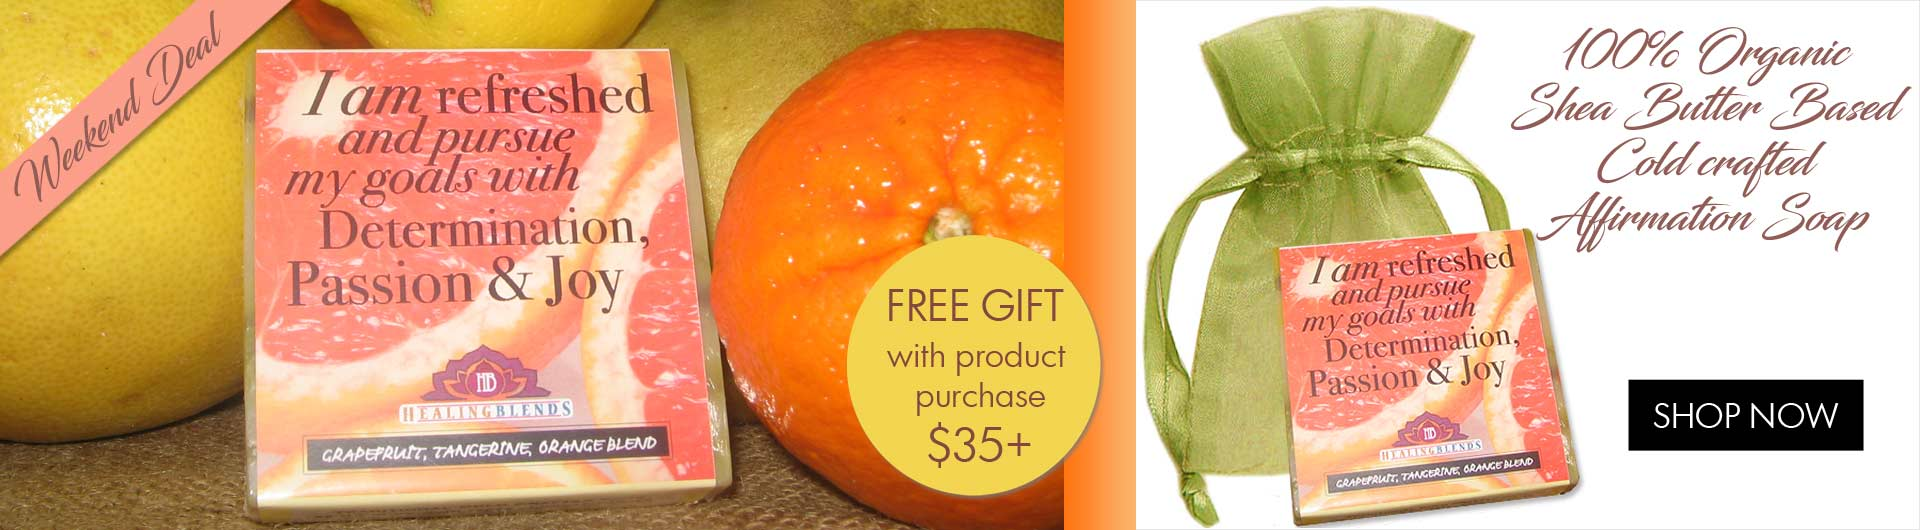 Grapefruit, Tangerine and Orange Affirmation Soap